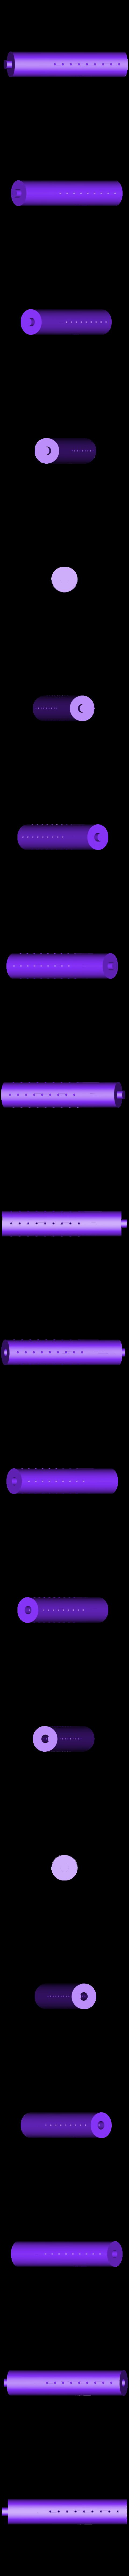 Colonne percéev2.stl Download STL file Display for Keychain and jewelry - Display for keychain and jewelry • 3D printer model, sebydjay